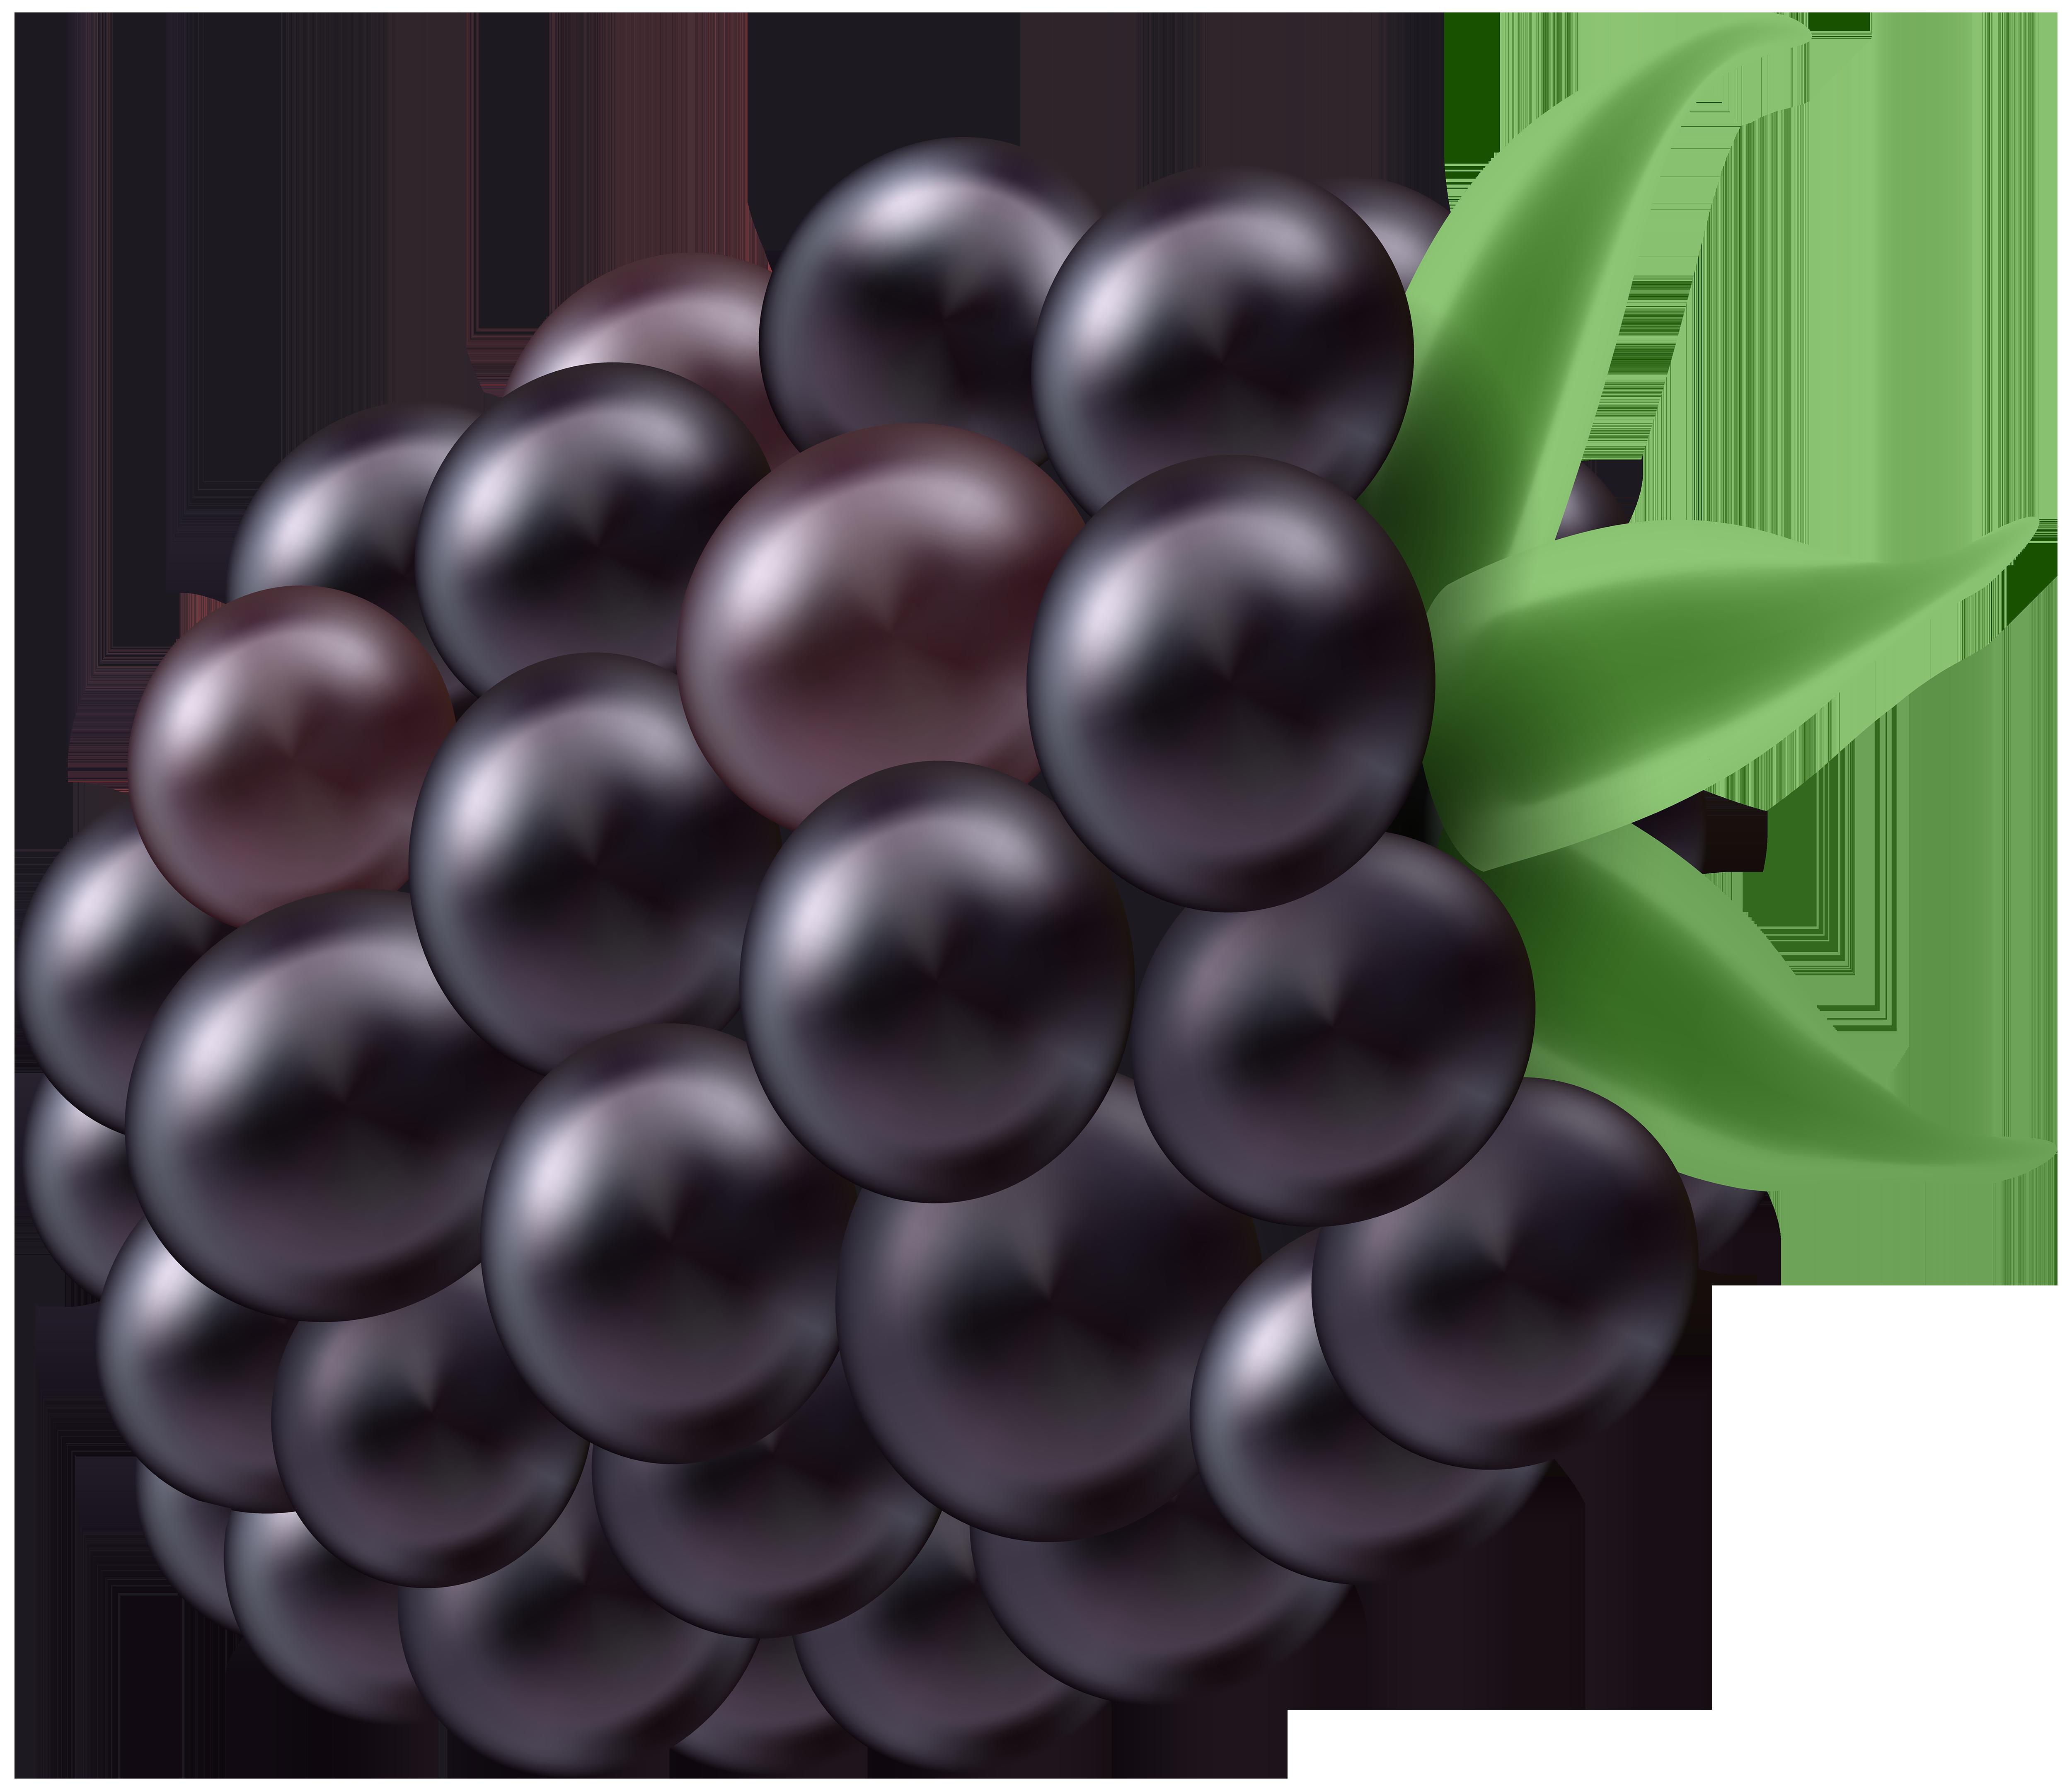 Png clip art image. Berries clipart blackberry